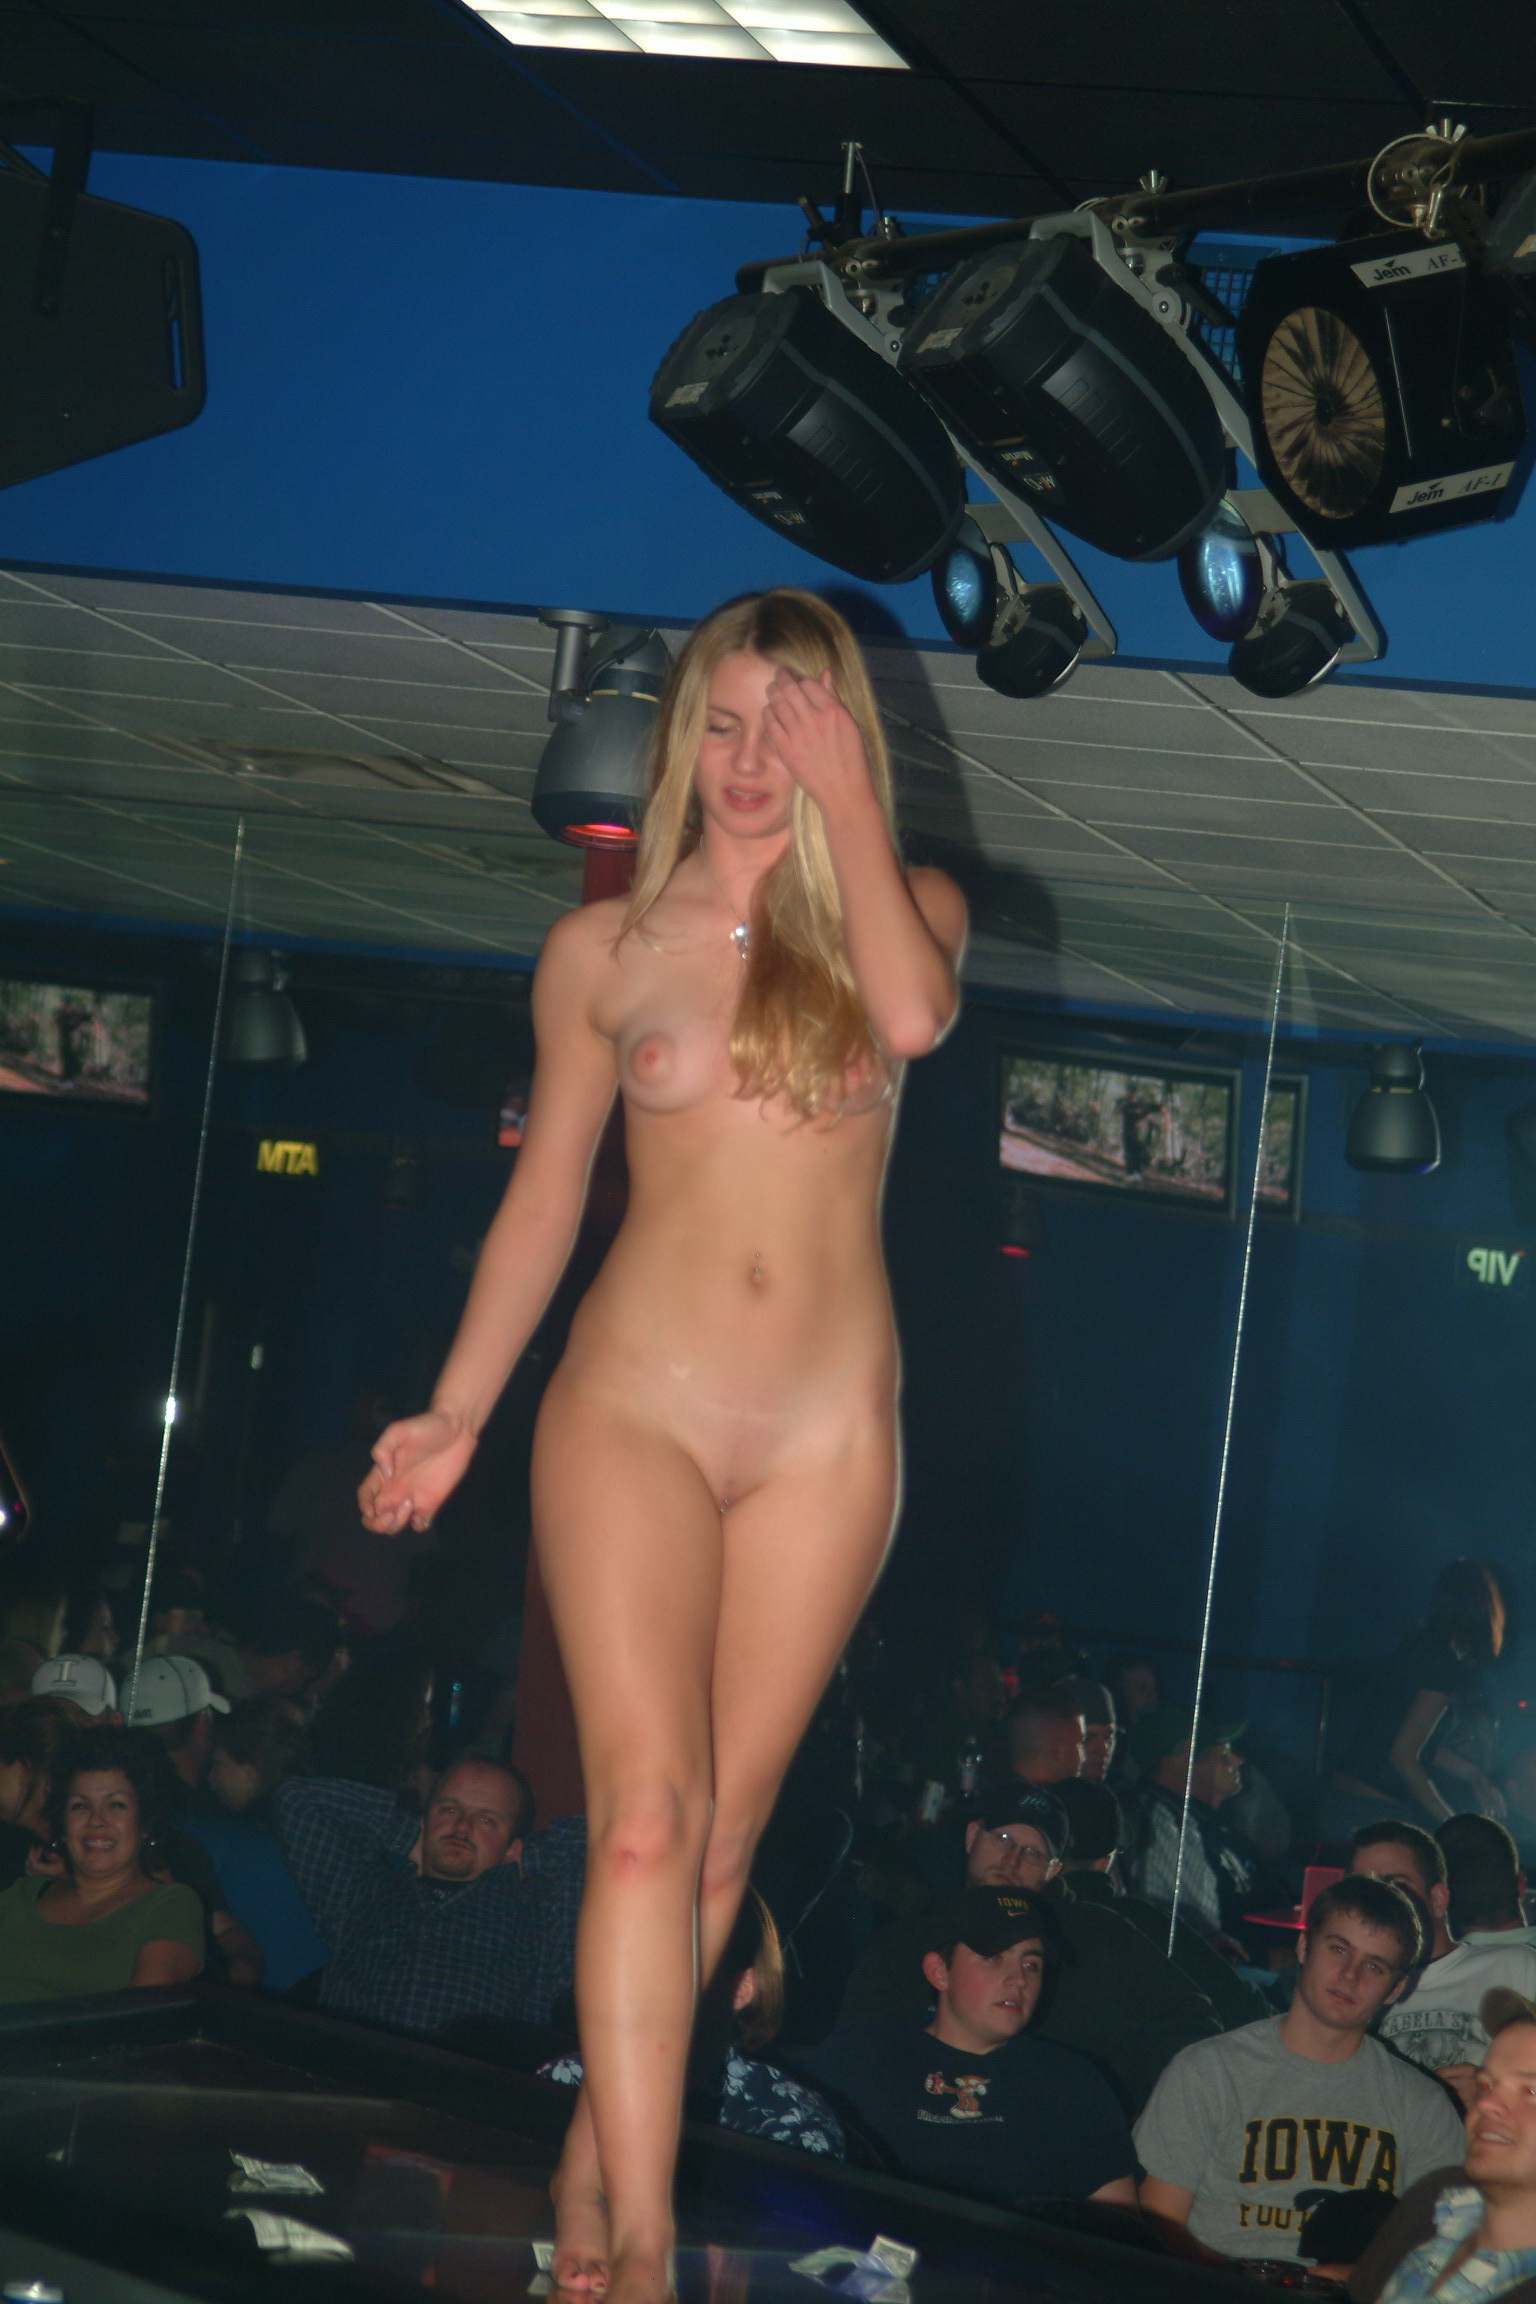 naked amateur stripper contest